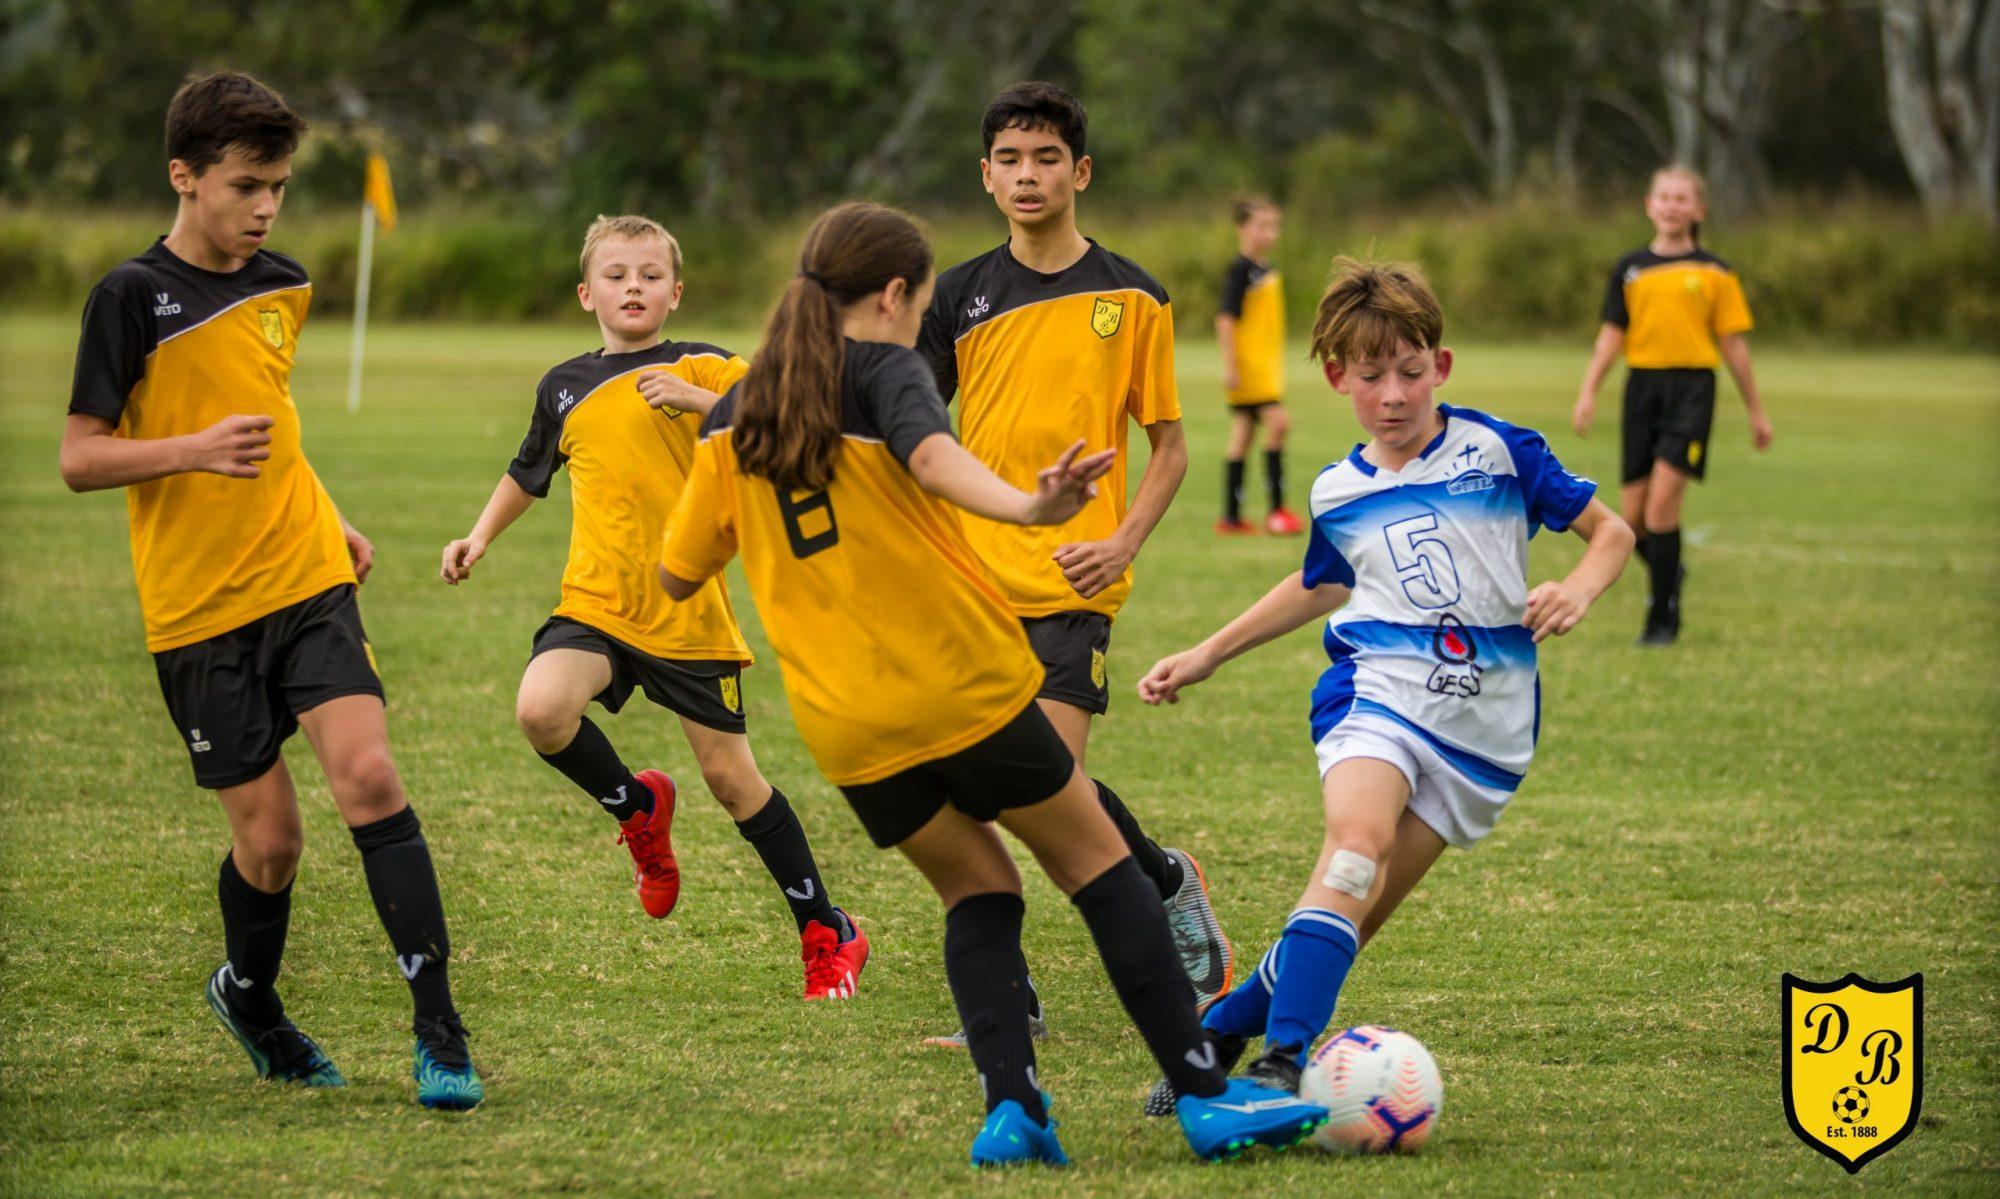 Dinmore Bushrats Soccer and Sports Club Inc